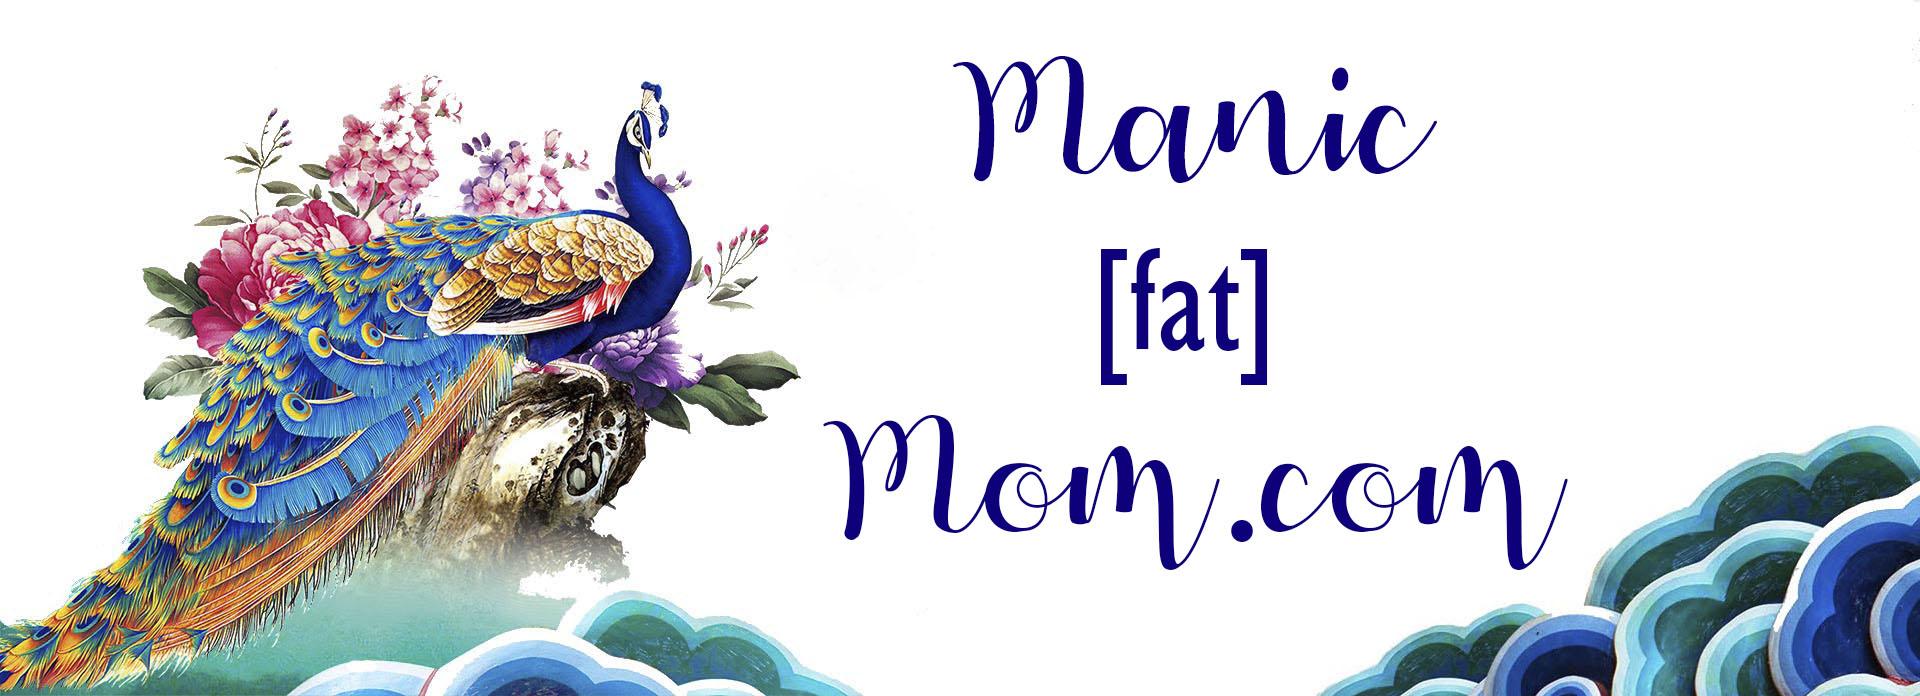 Manic Fat Mom